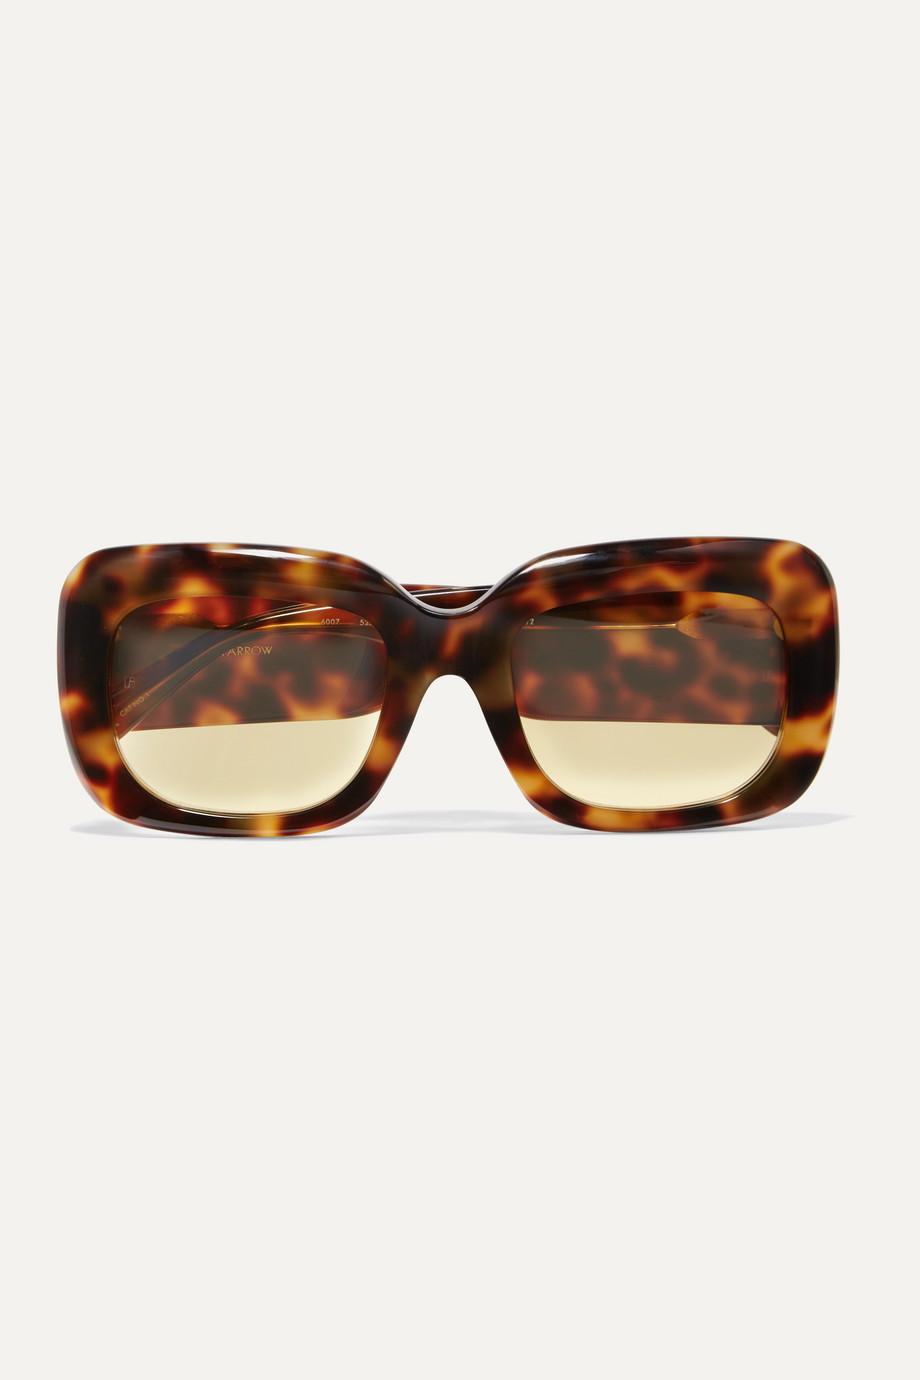 Linda Farrow Square-frame tortoiseshell acetate sunglasses